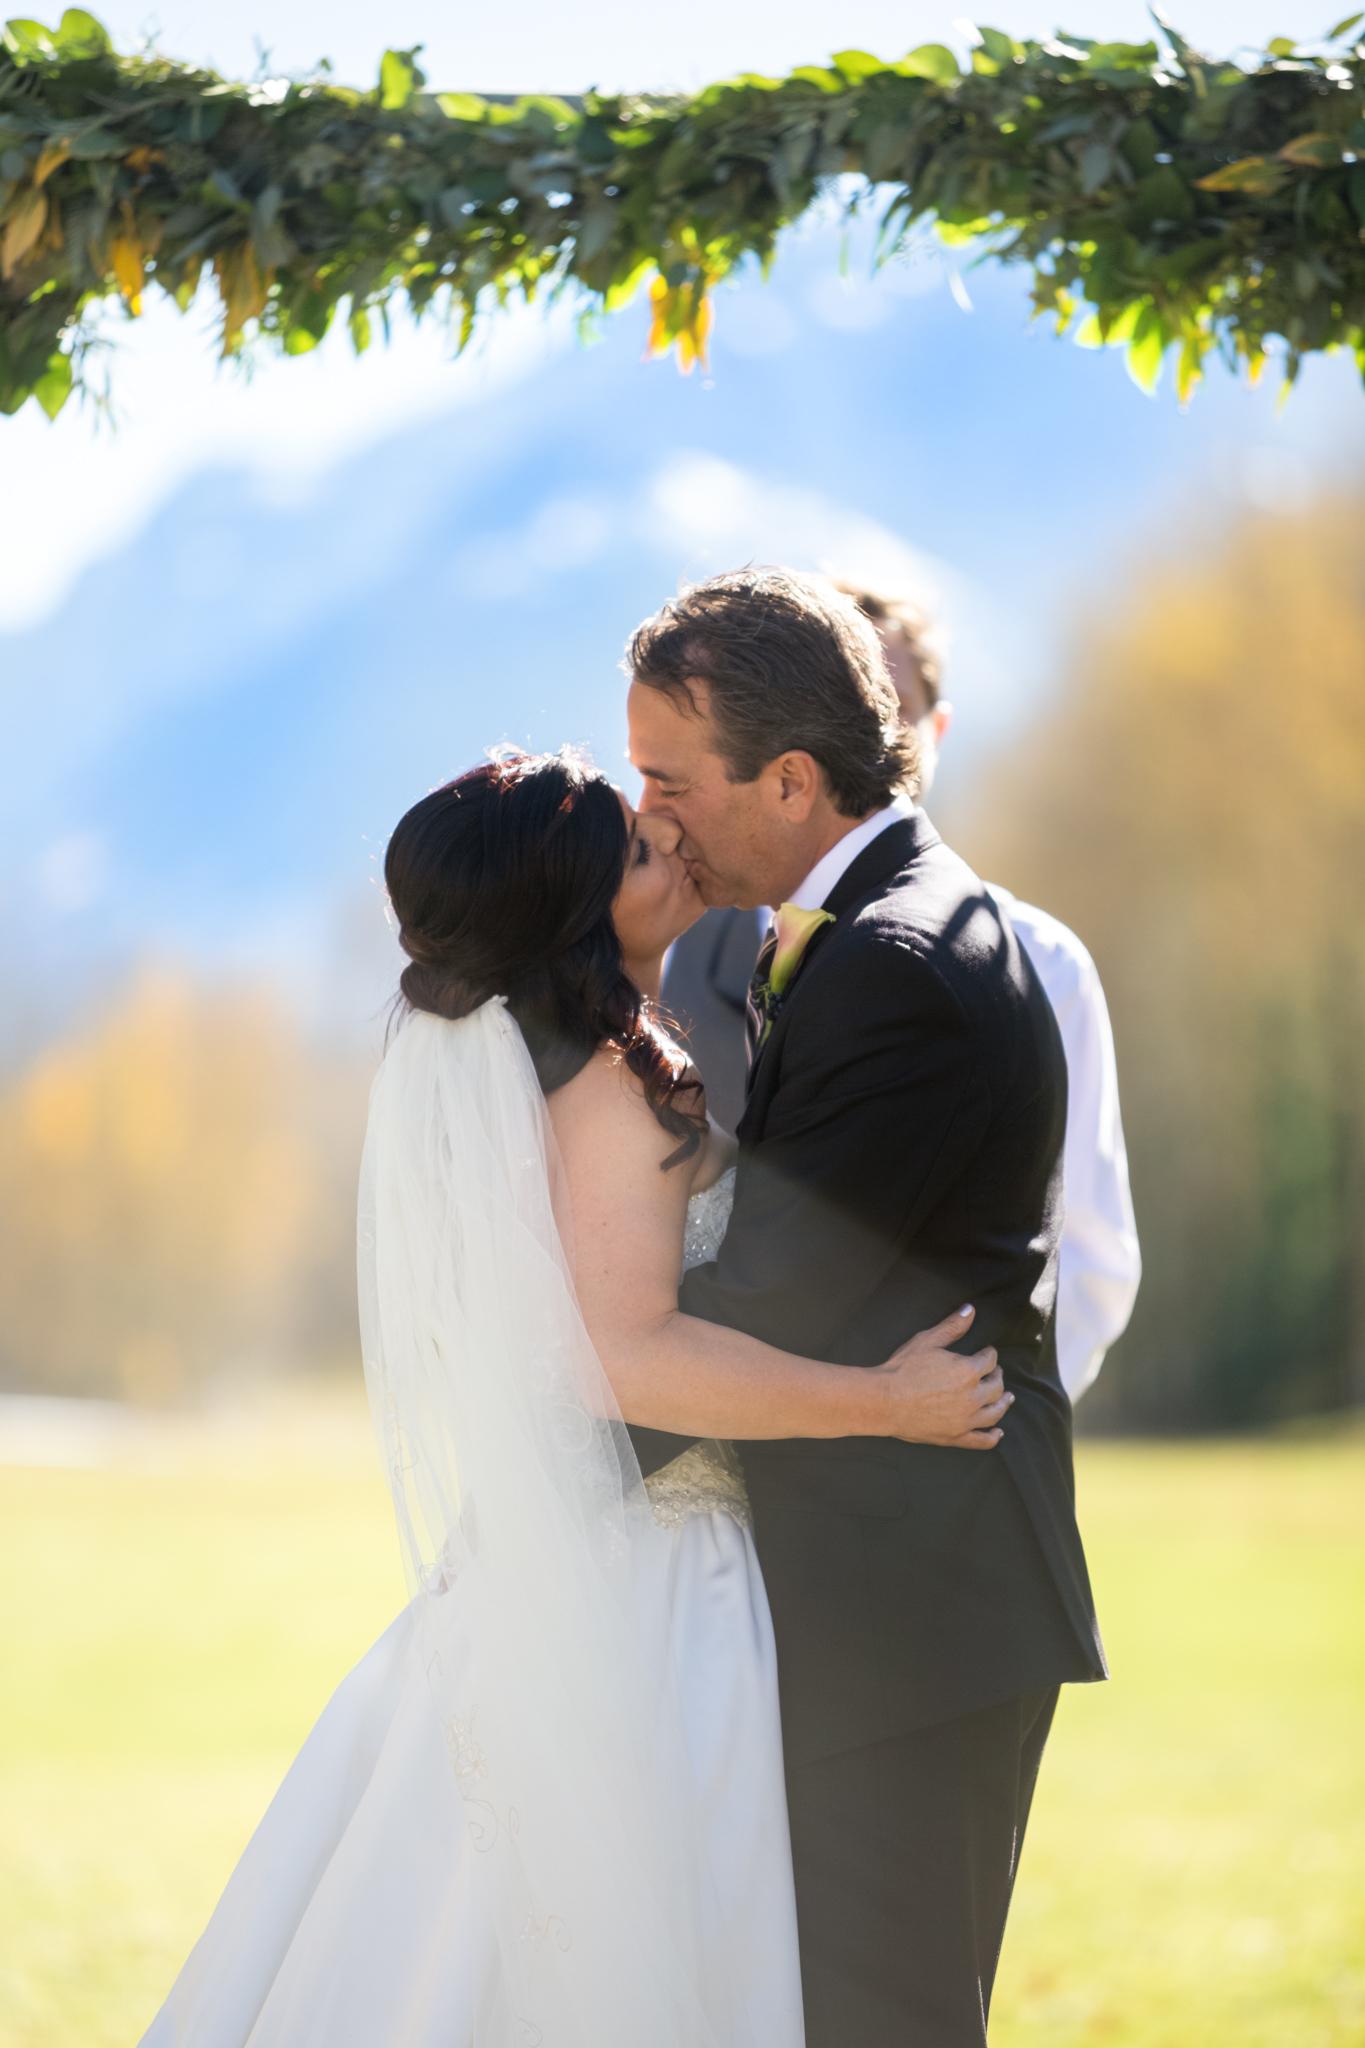 lady-ilg-photography-kathryn-kim-associate-colorado-wedding-photographer (6)